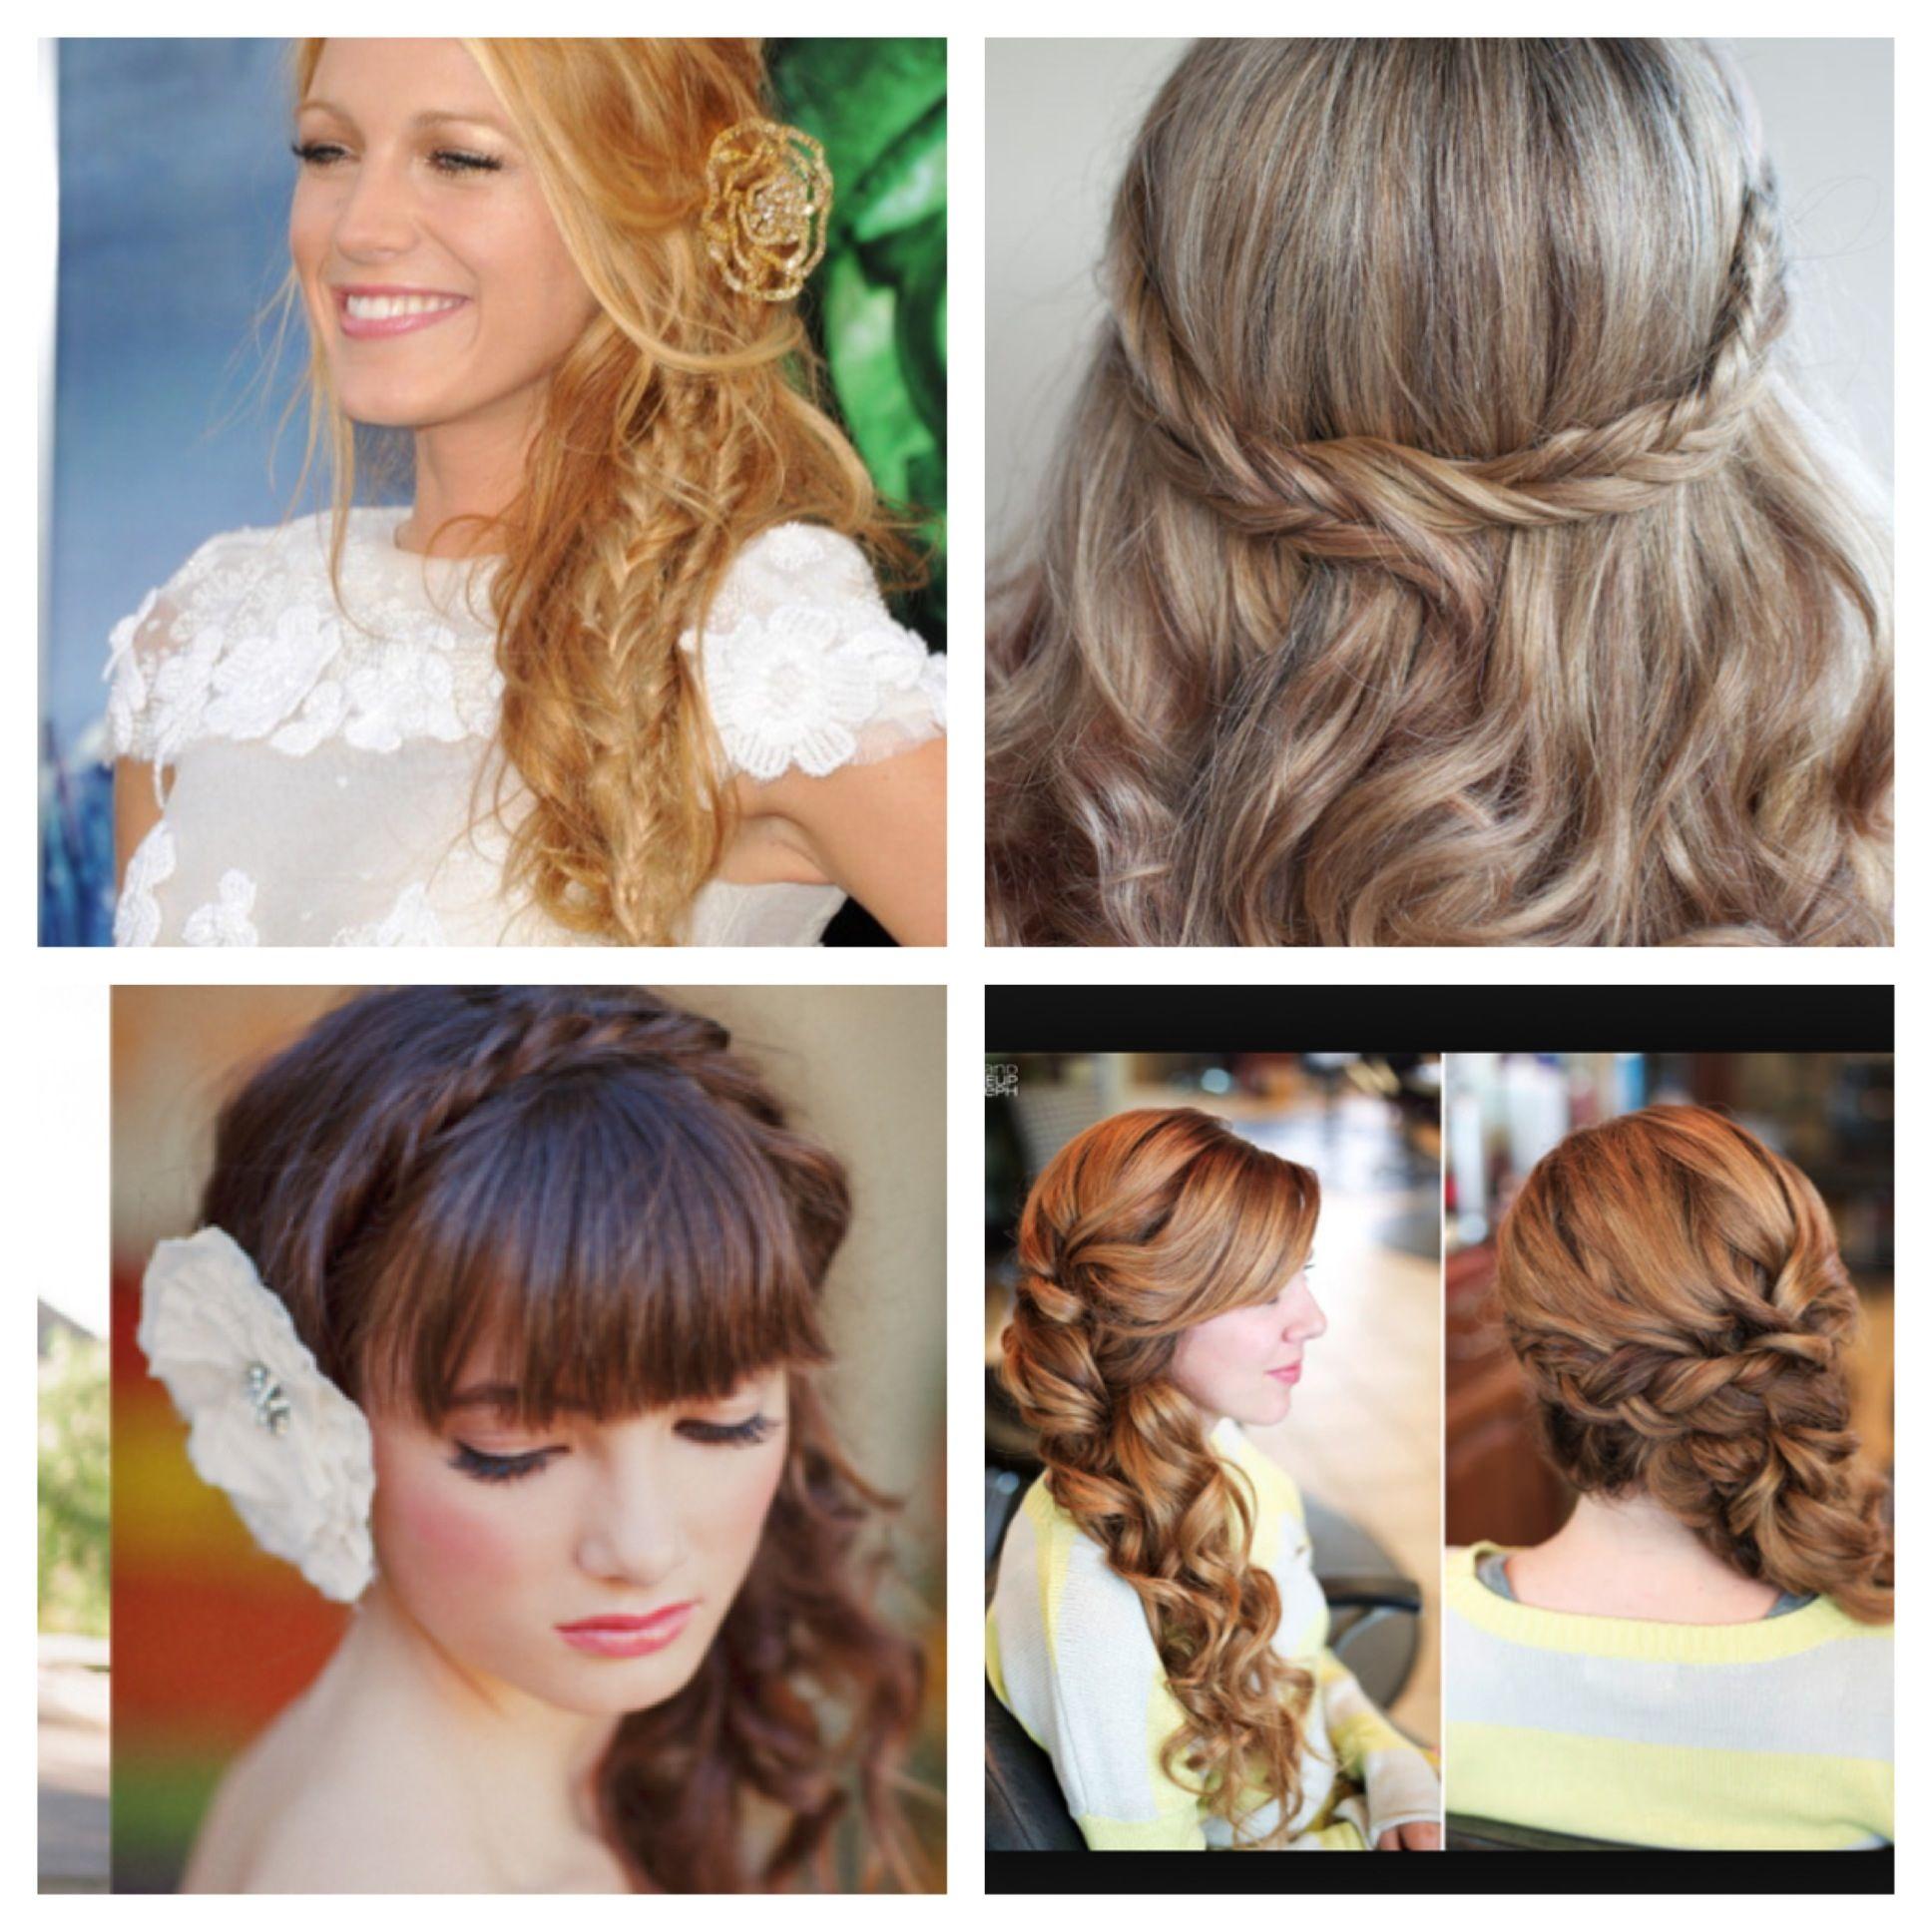 Bridesmaid hairstyles wedding pinterest hair styles